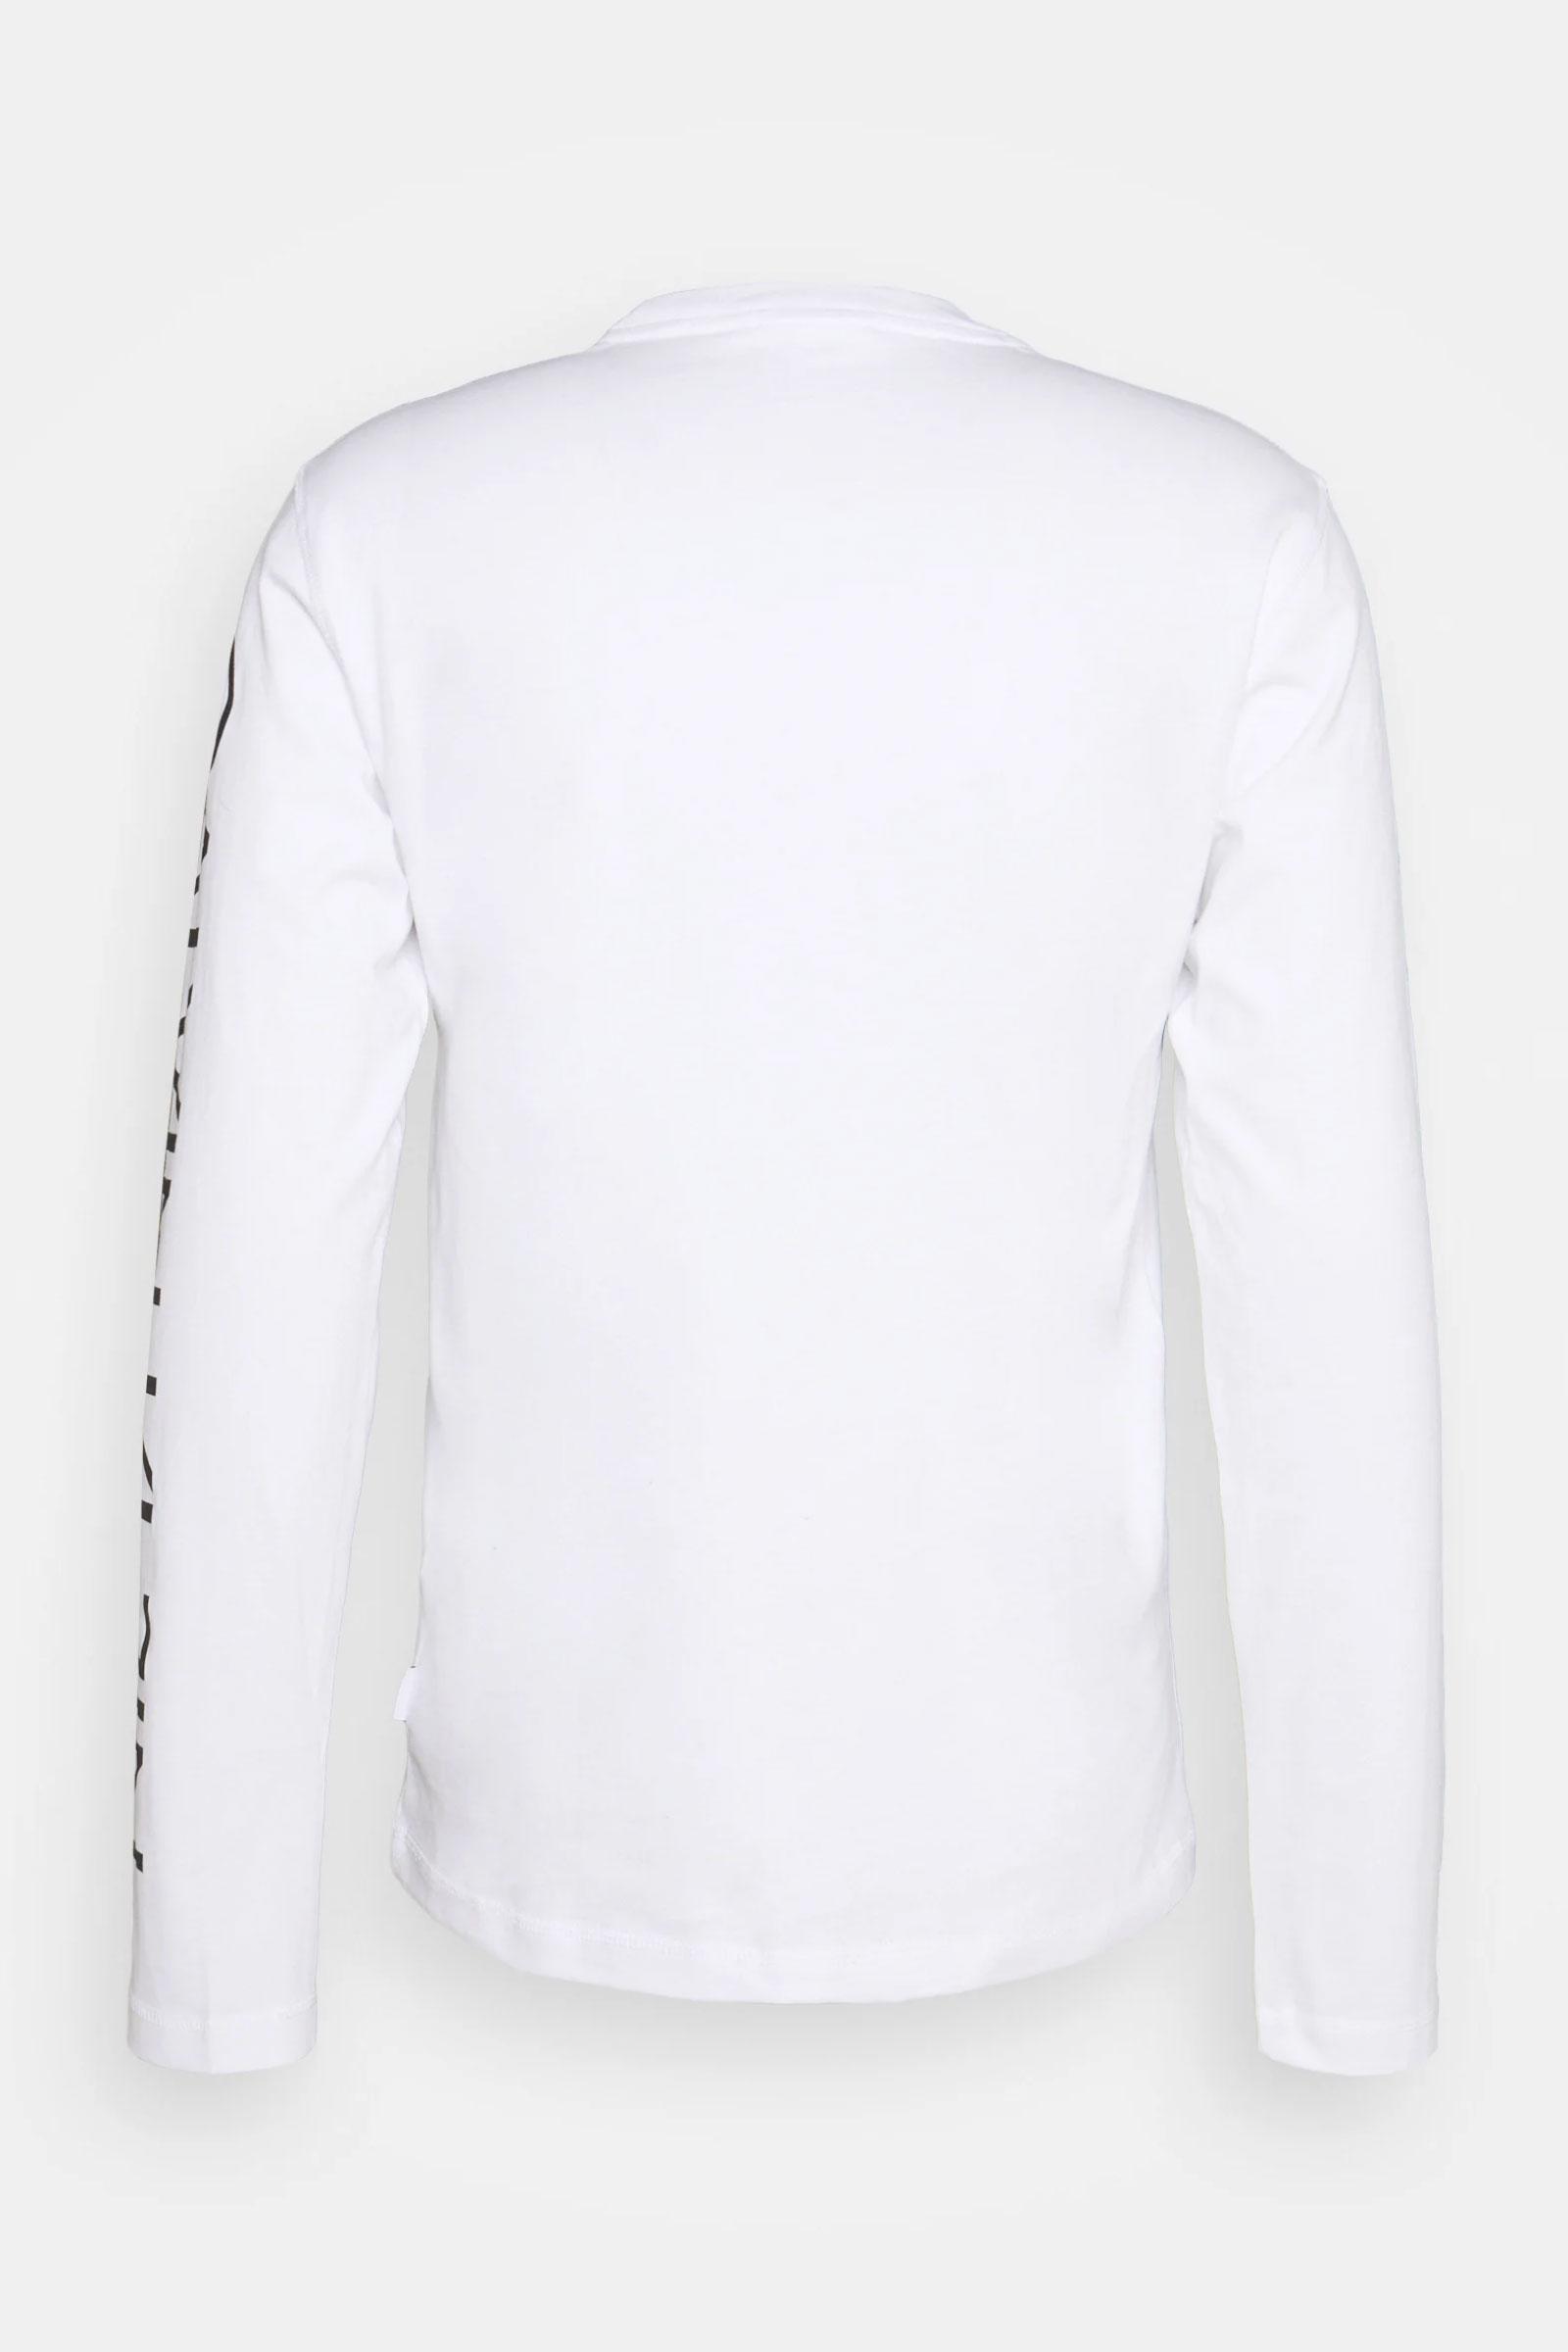 CALVIN KLEIN Men's T-Shirt CALVIN KLEIN | T-Shirt | K10K106492YAF